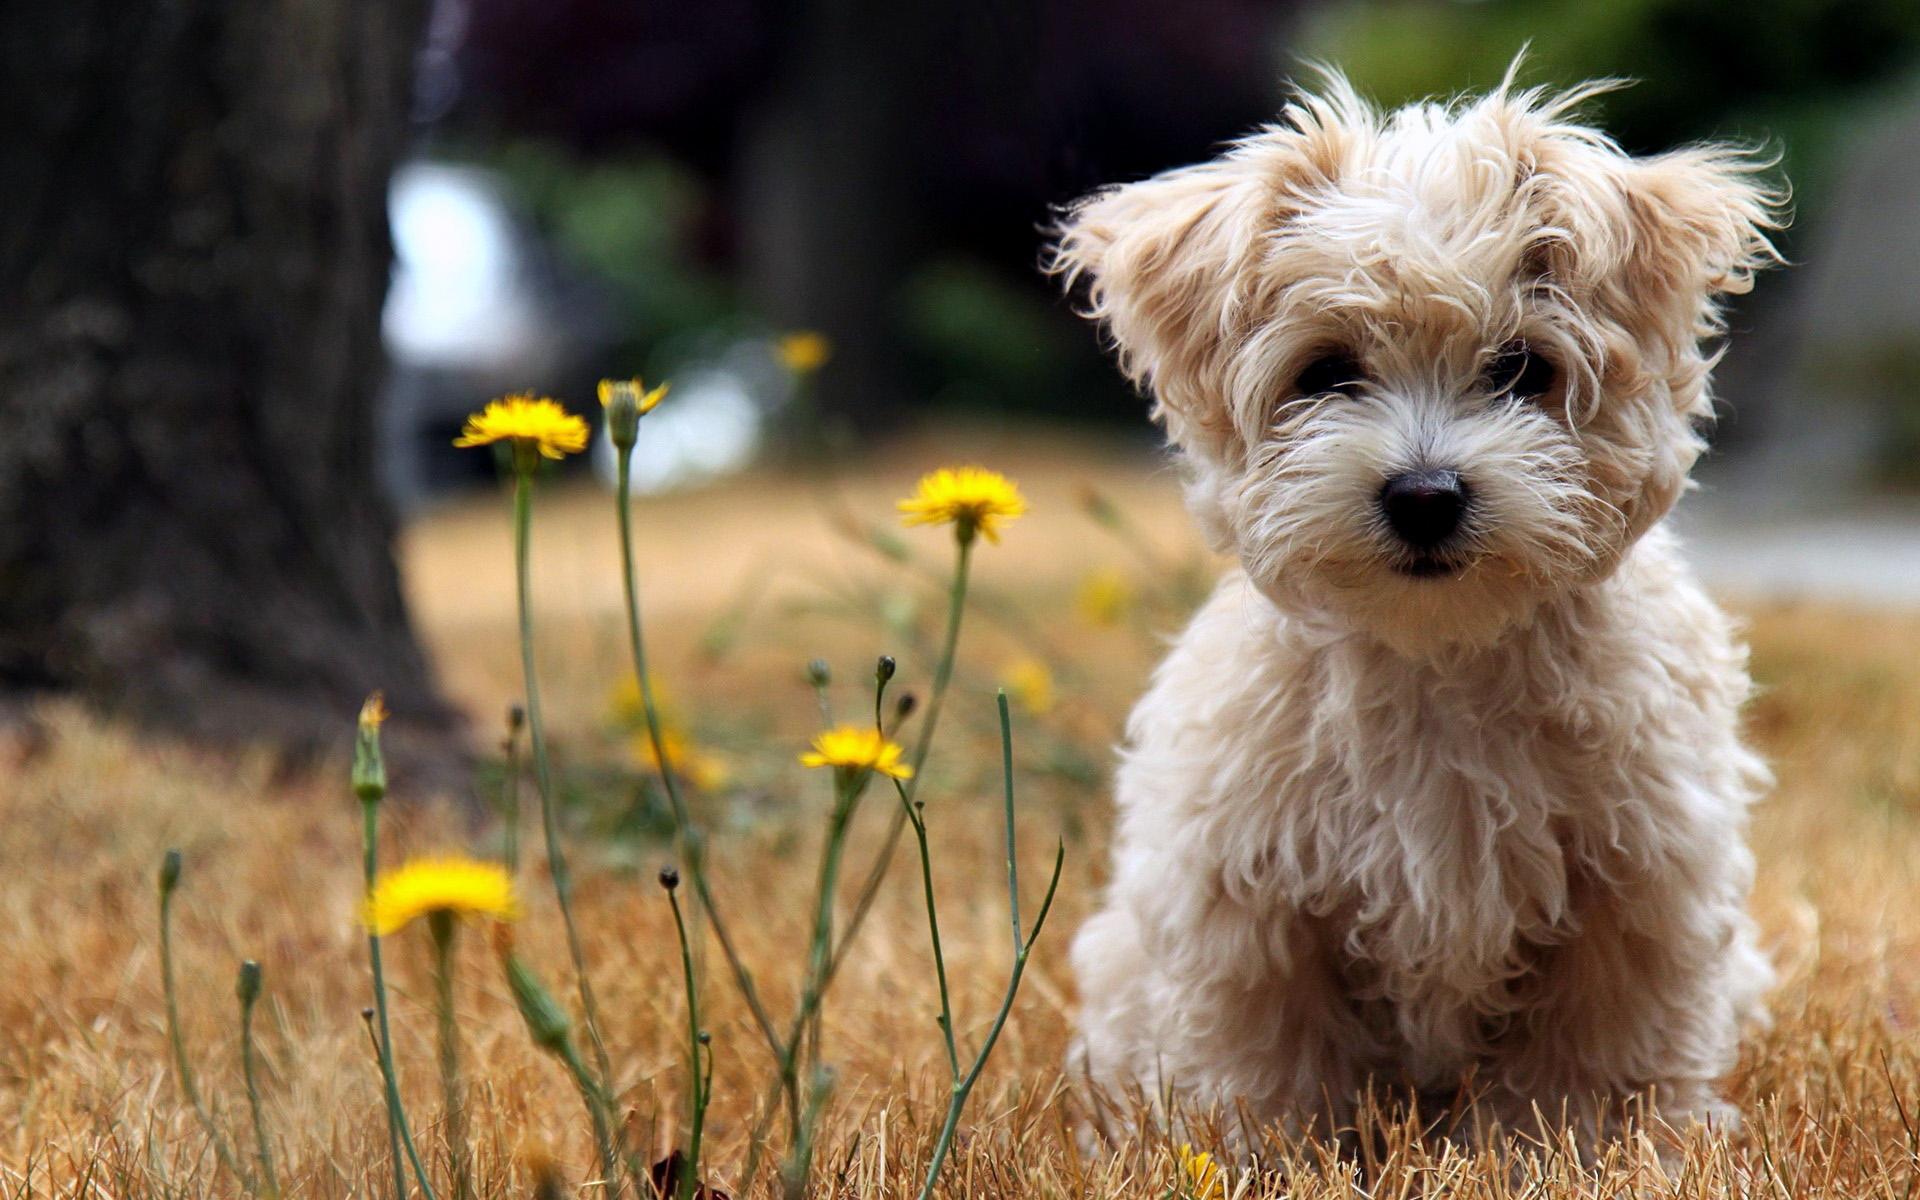 cute_dog_animals_mobile_wallpaper.jpg